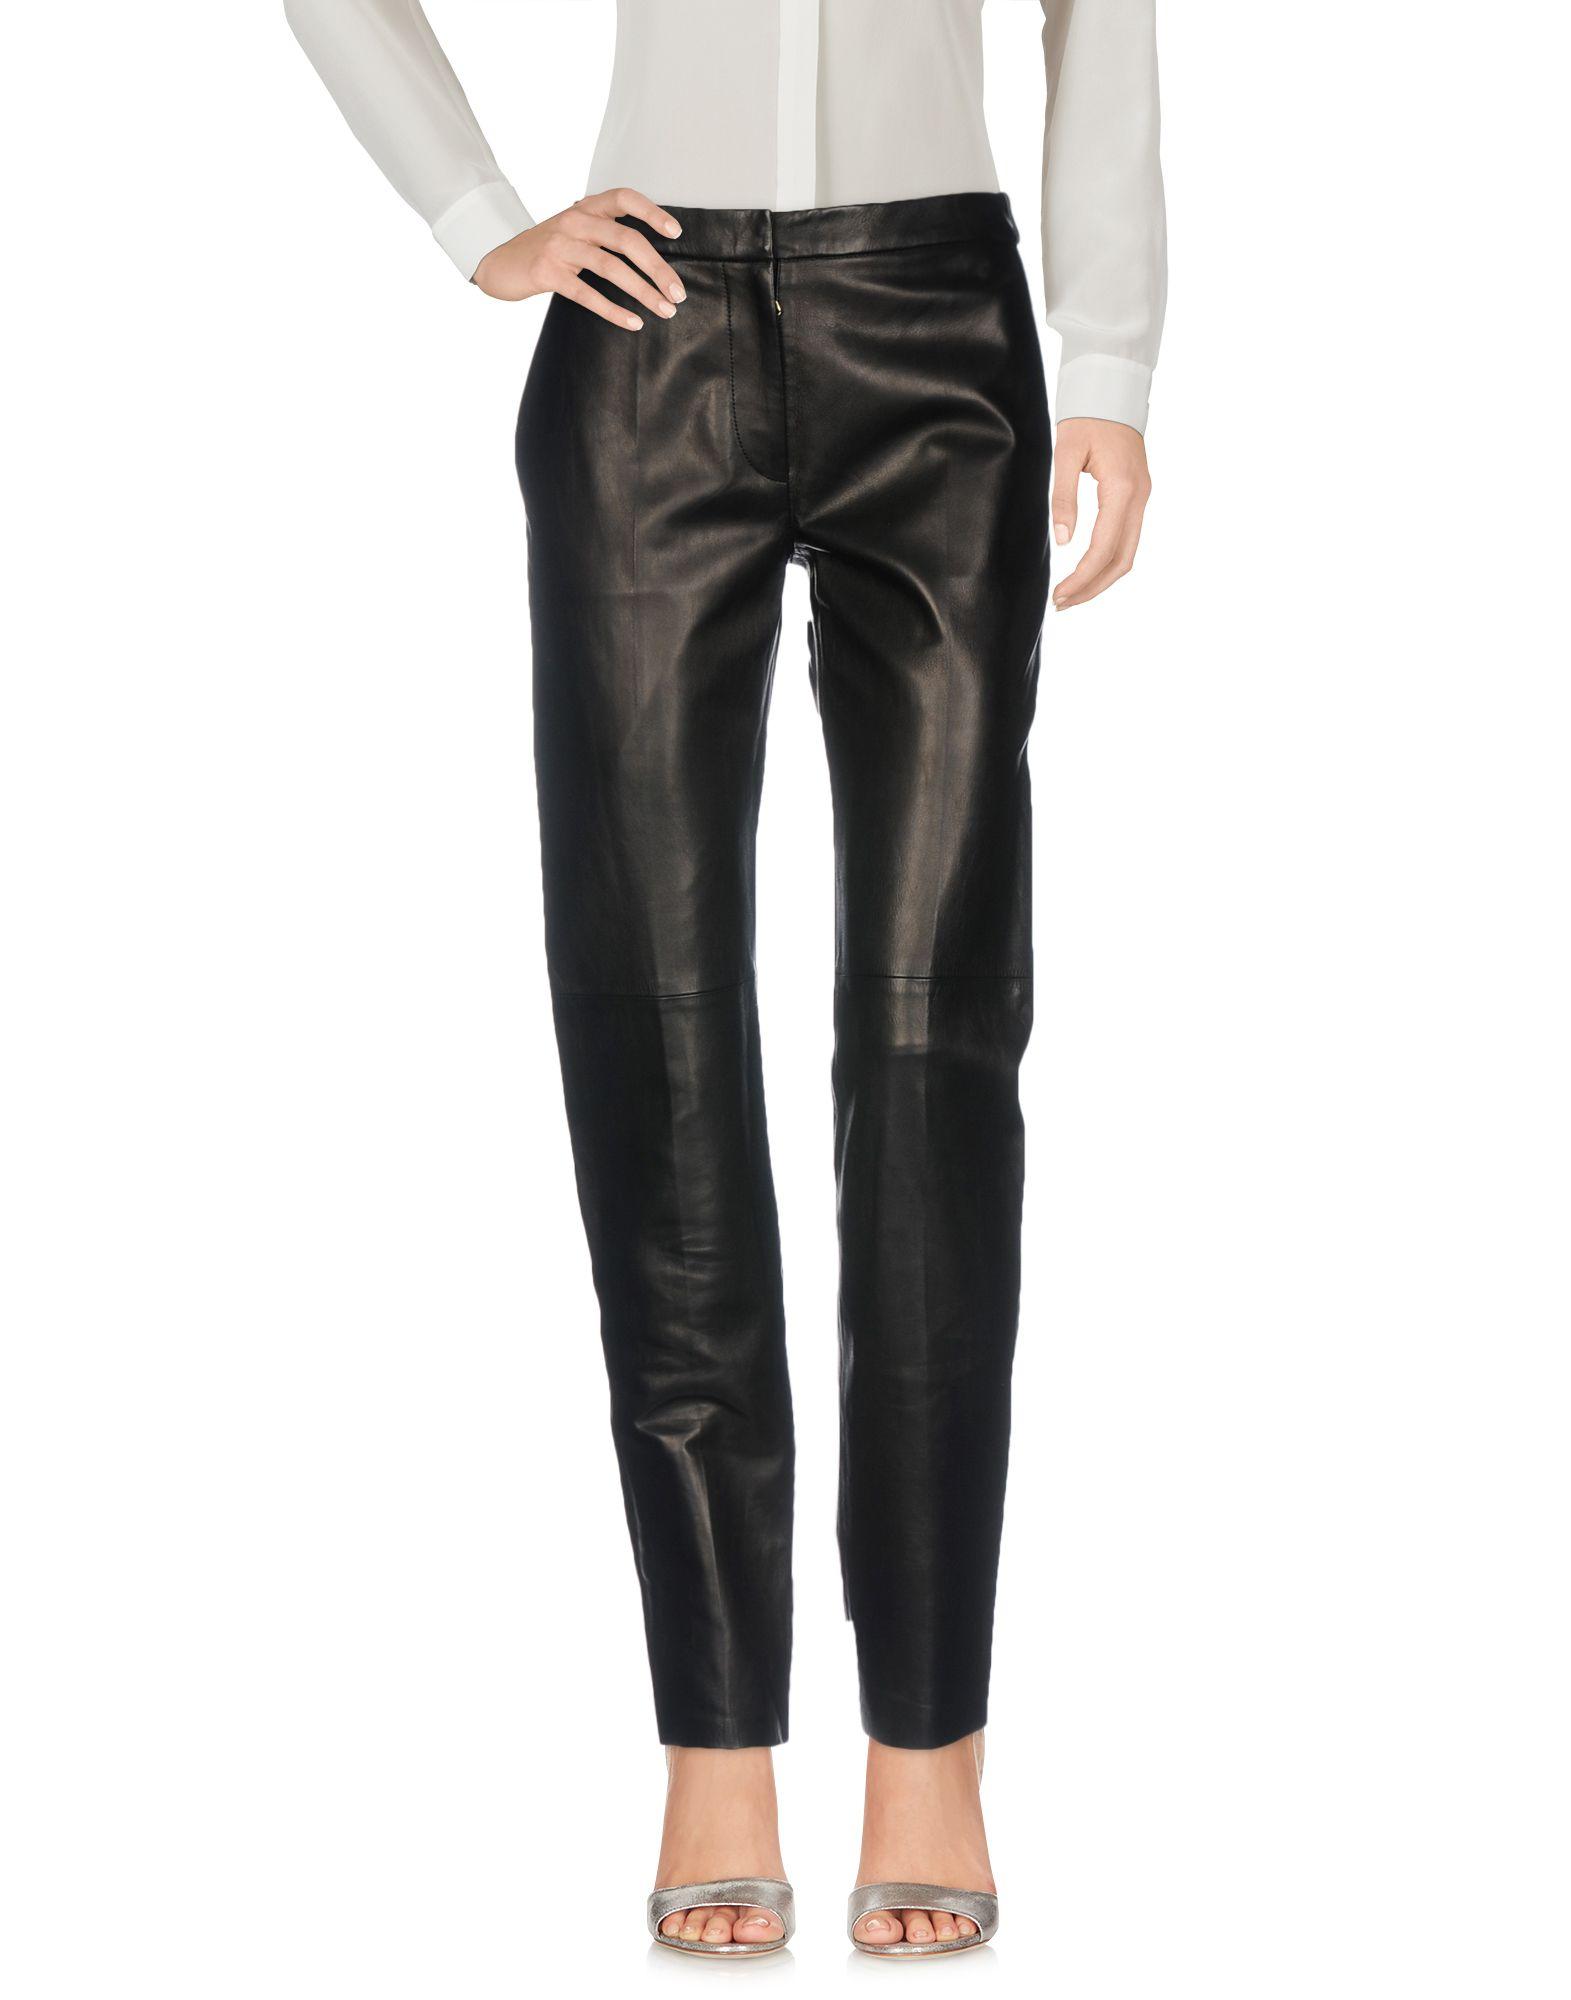 Pantalone Blumarine Donna - Acquista online su 3cvQO67